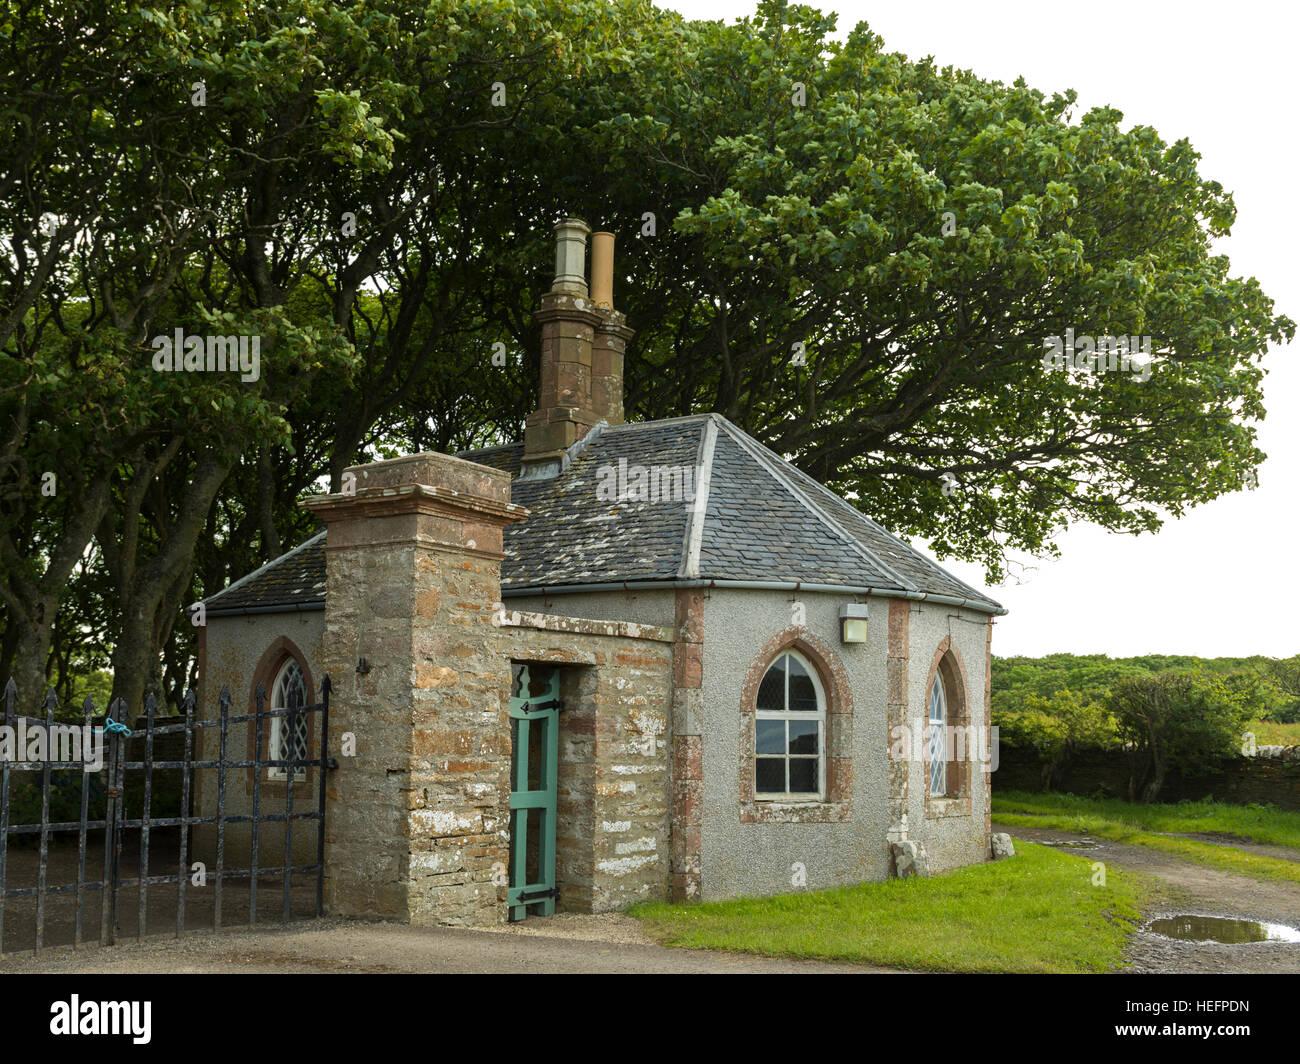 Castle of Mey, Caithness, Scottish Highlands, Scotland - Stock Image